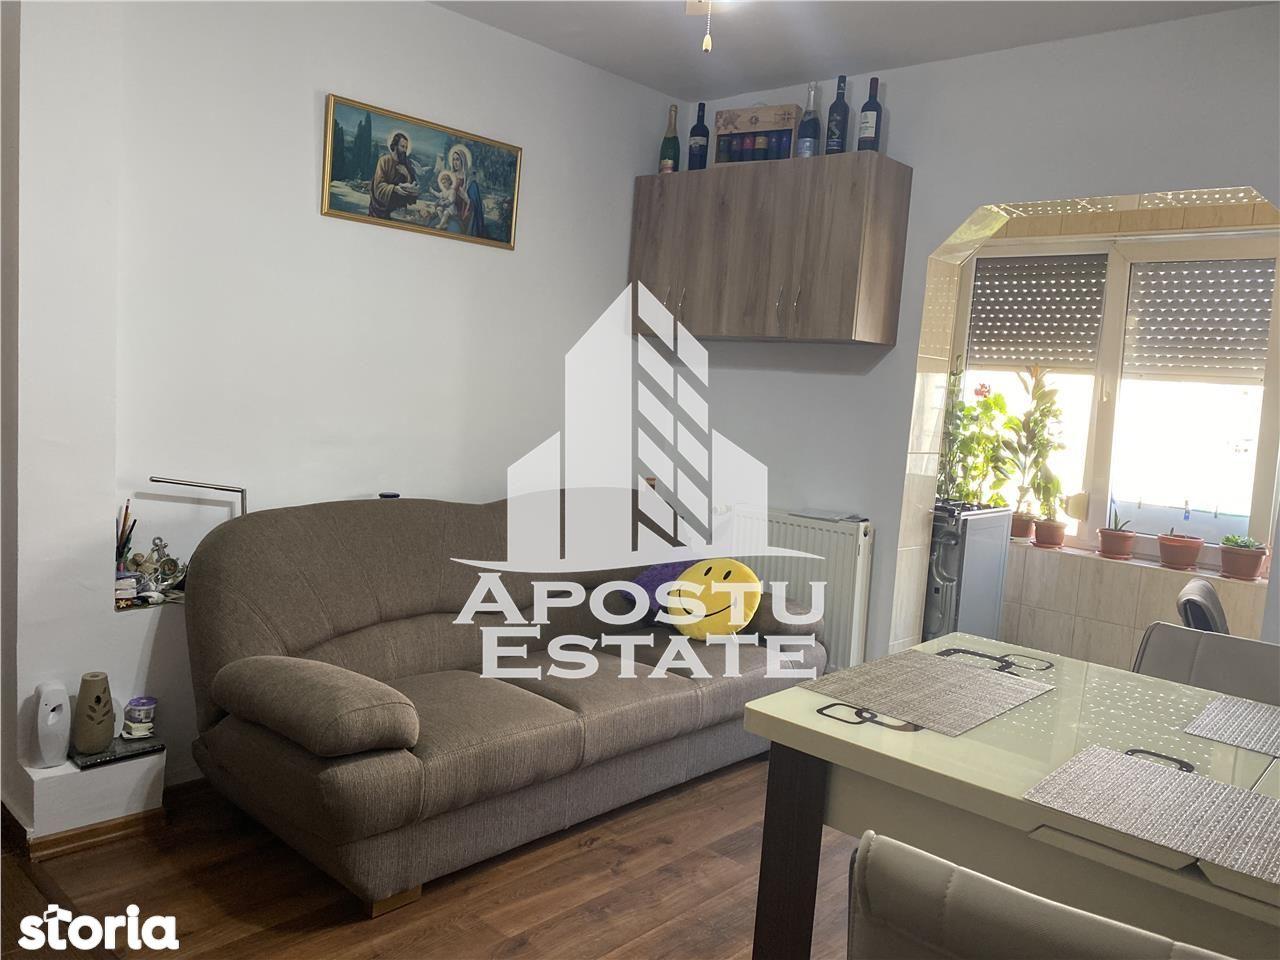 Apartament cu 2 camere Decomandat zona Dorobantilor centrala proprie.